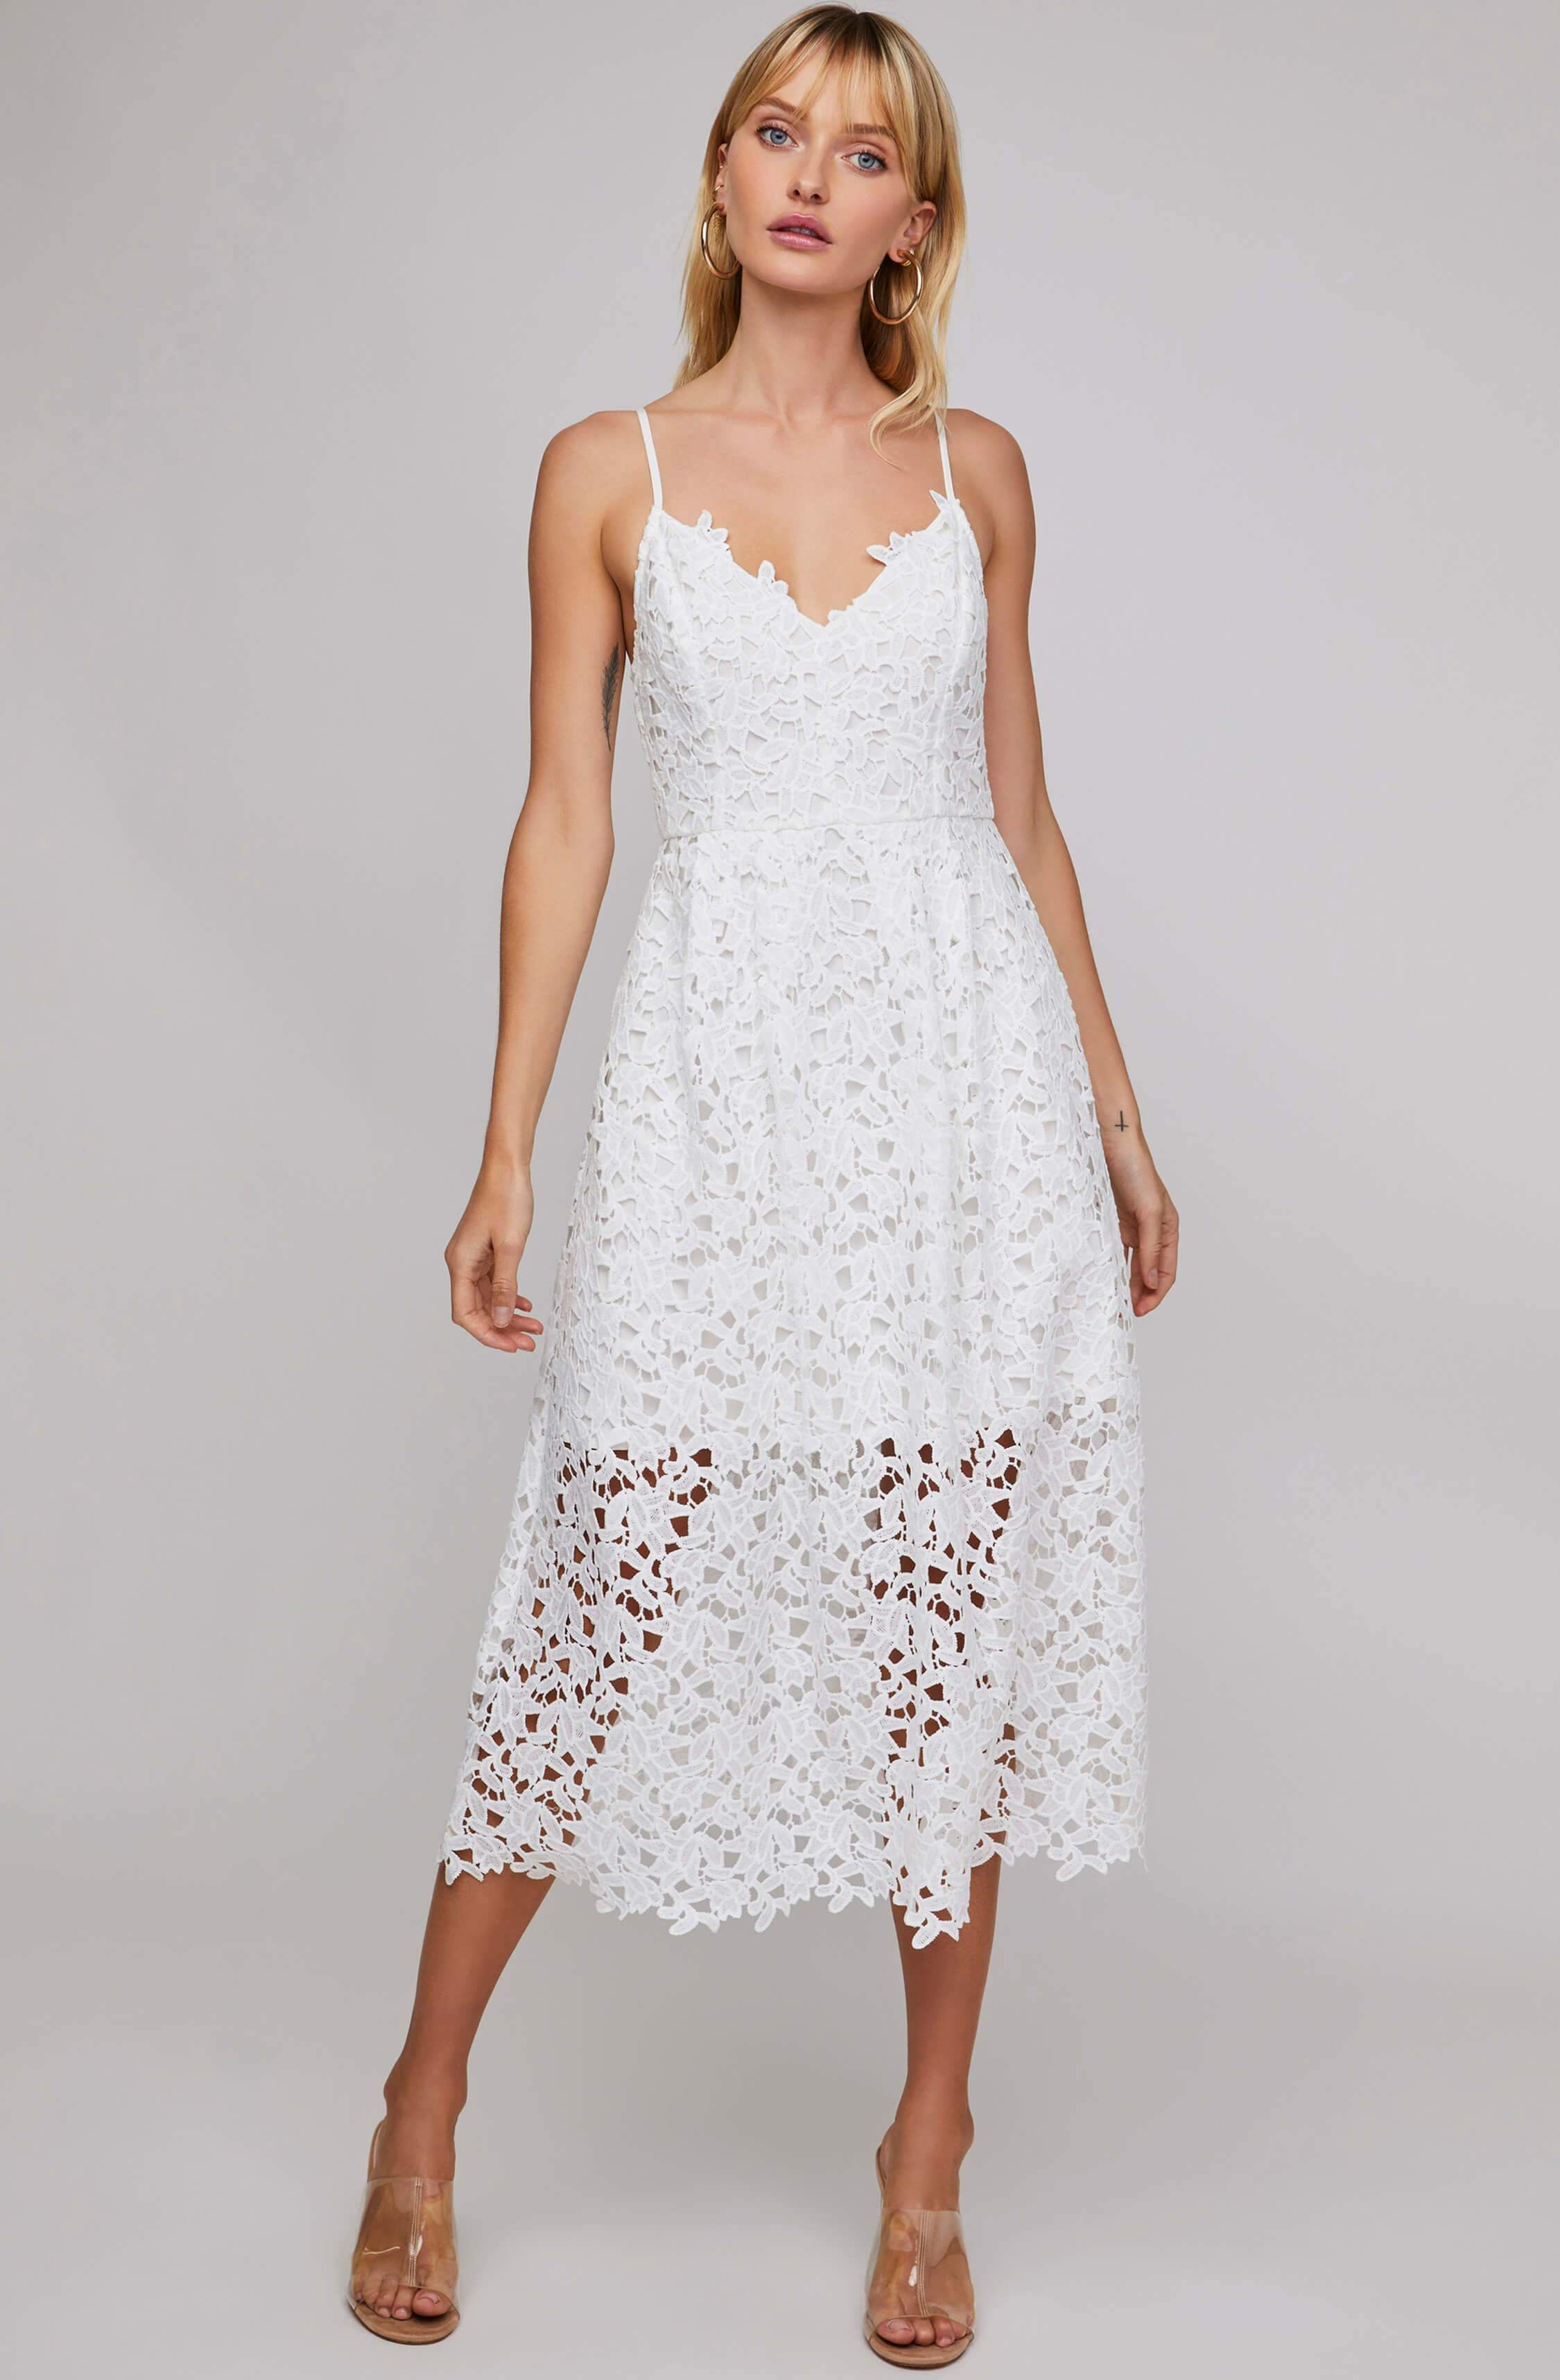 Astr Lace A Line Midi Dress Astr The Label White Midi Dress Lace Midi Dress Lace White Dress [ 3432 x 2250 Pixel ]